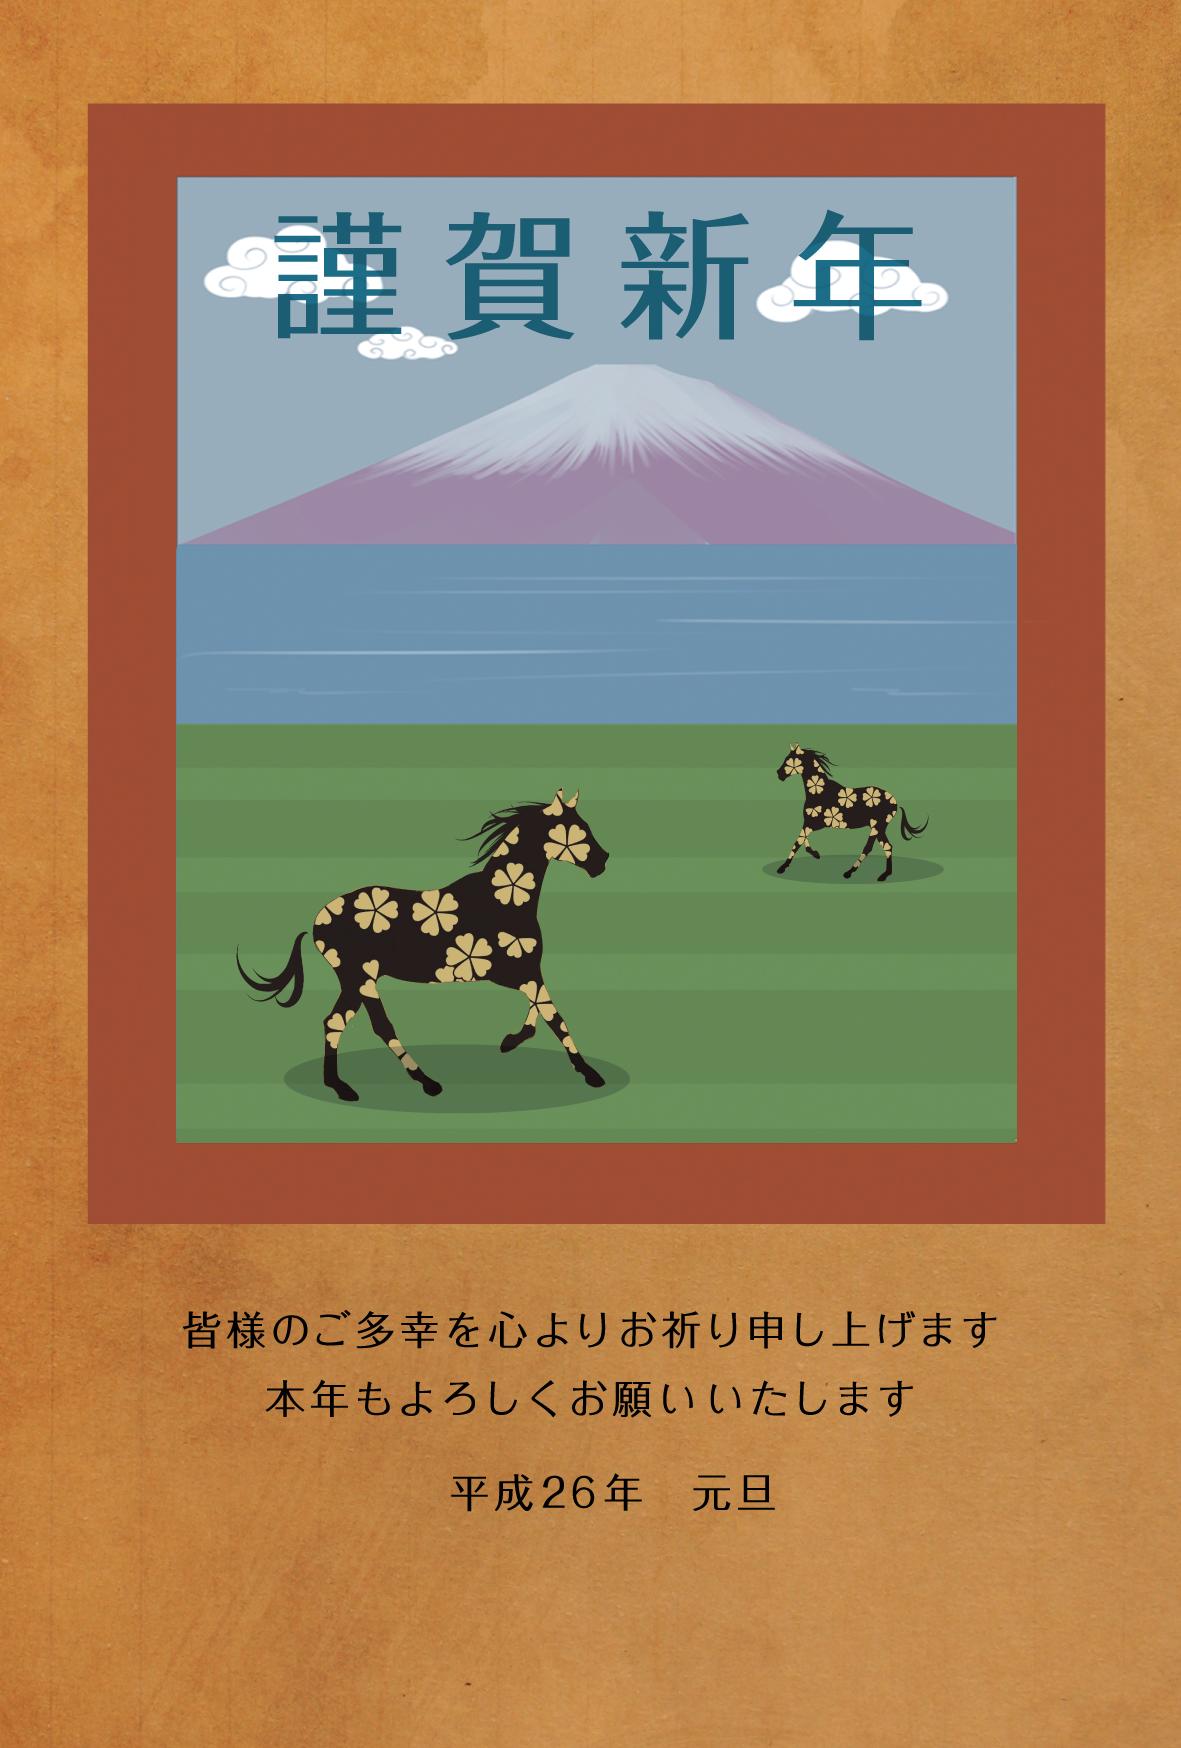 謹賀新年 富士山と馬の年賀状素材